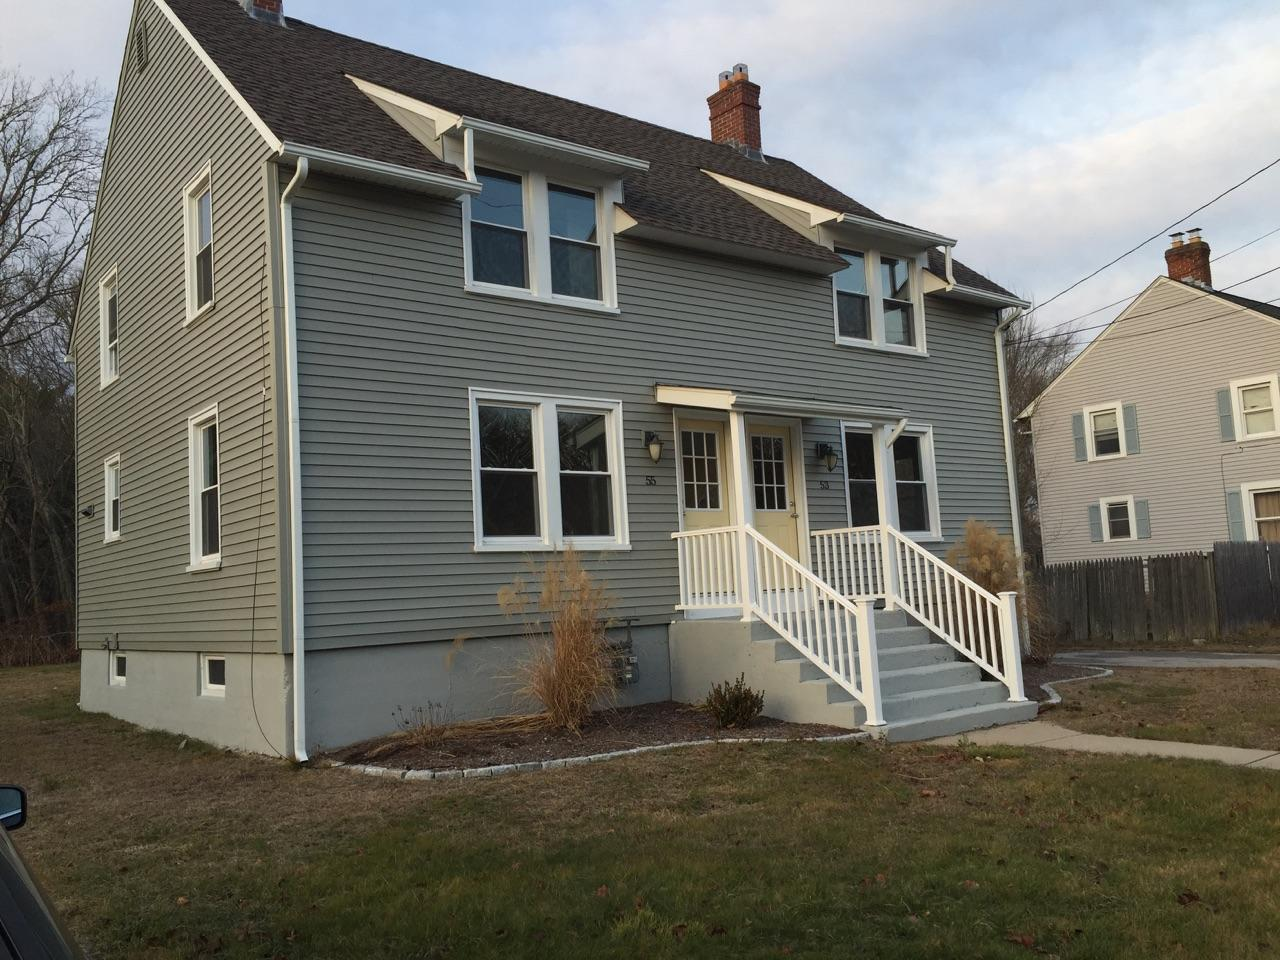 53-55 Bowling Lane, Westerly, Rhode Island 02808